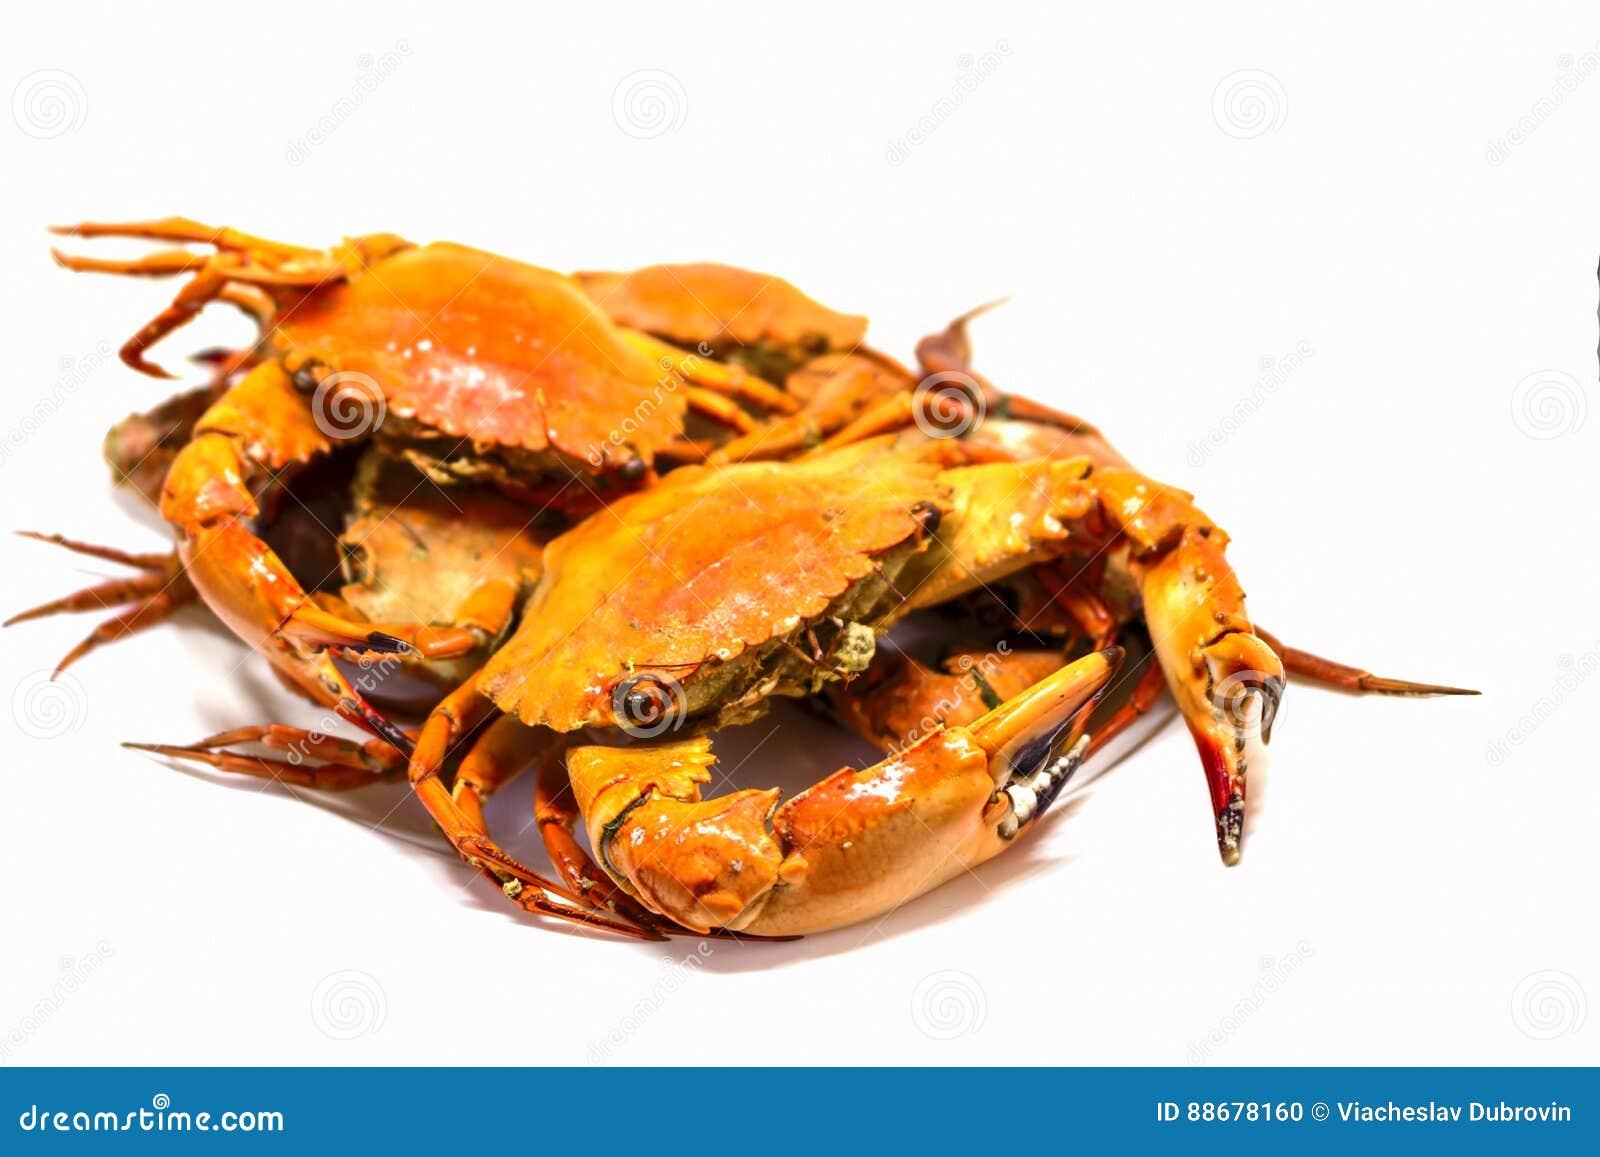 Red Crab Studio Photo For Restaurant Menu Or Cooking Recipe Book